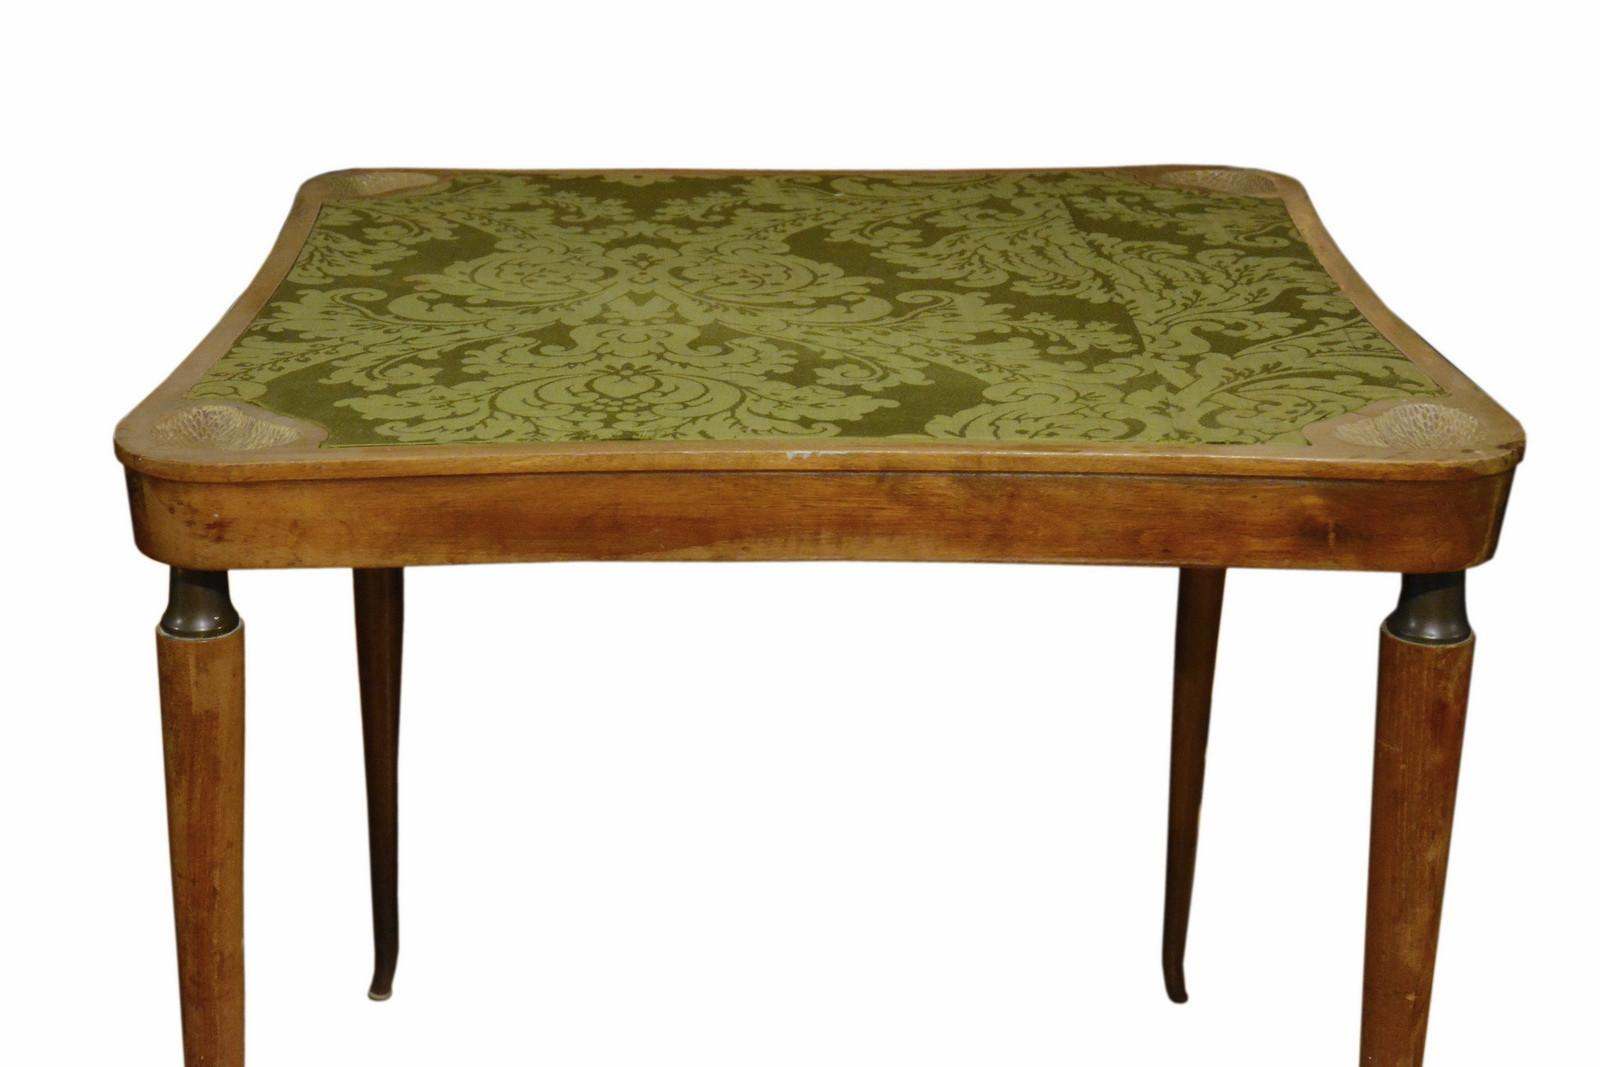 tavolo-inglese-anni-20-scrittorio-e-gioco-poker-2,2958.jpg?WebbinsCacheCounter=1